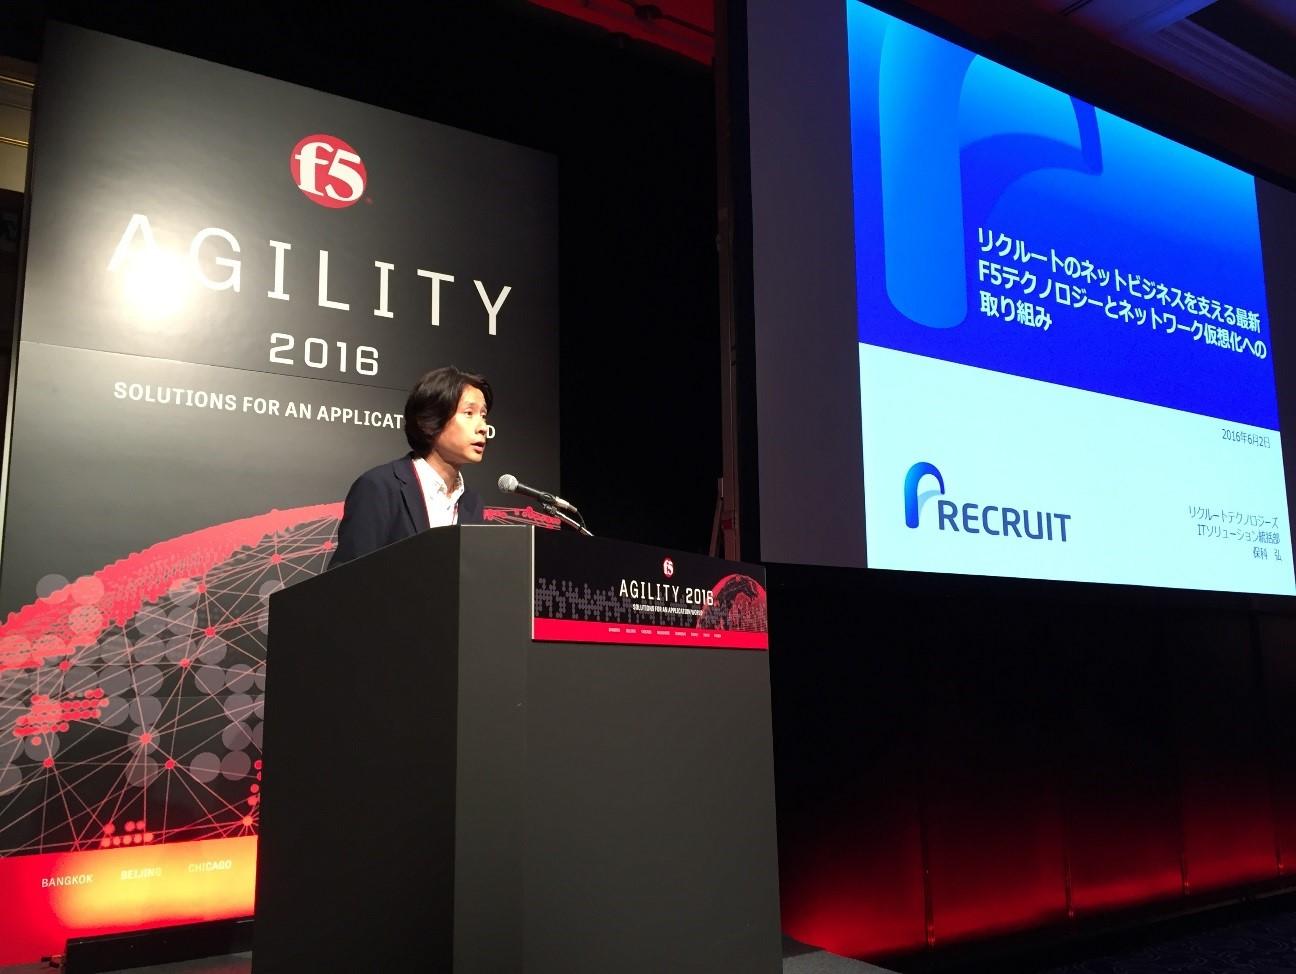 F5社国内最大イベント F5 Agility 2016で講演しました